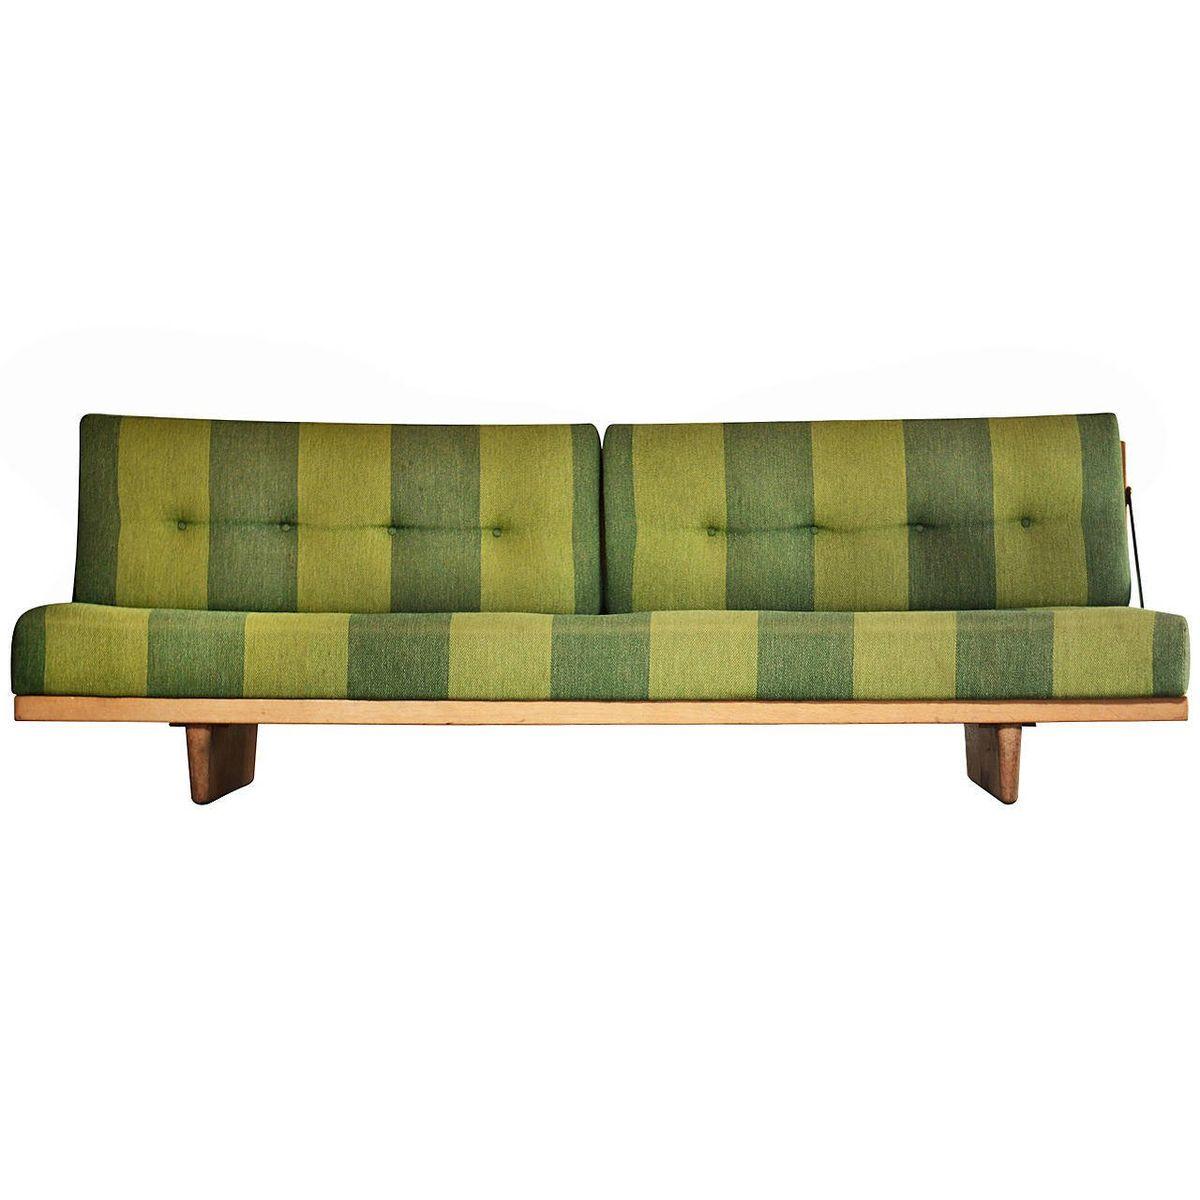 Model 191 Sofa Or Daybed In Oak By Børge Mogensen For Fredericia  Stolefabrik, 1955